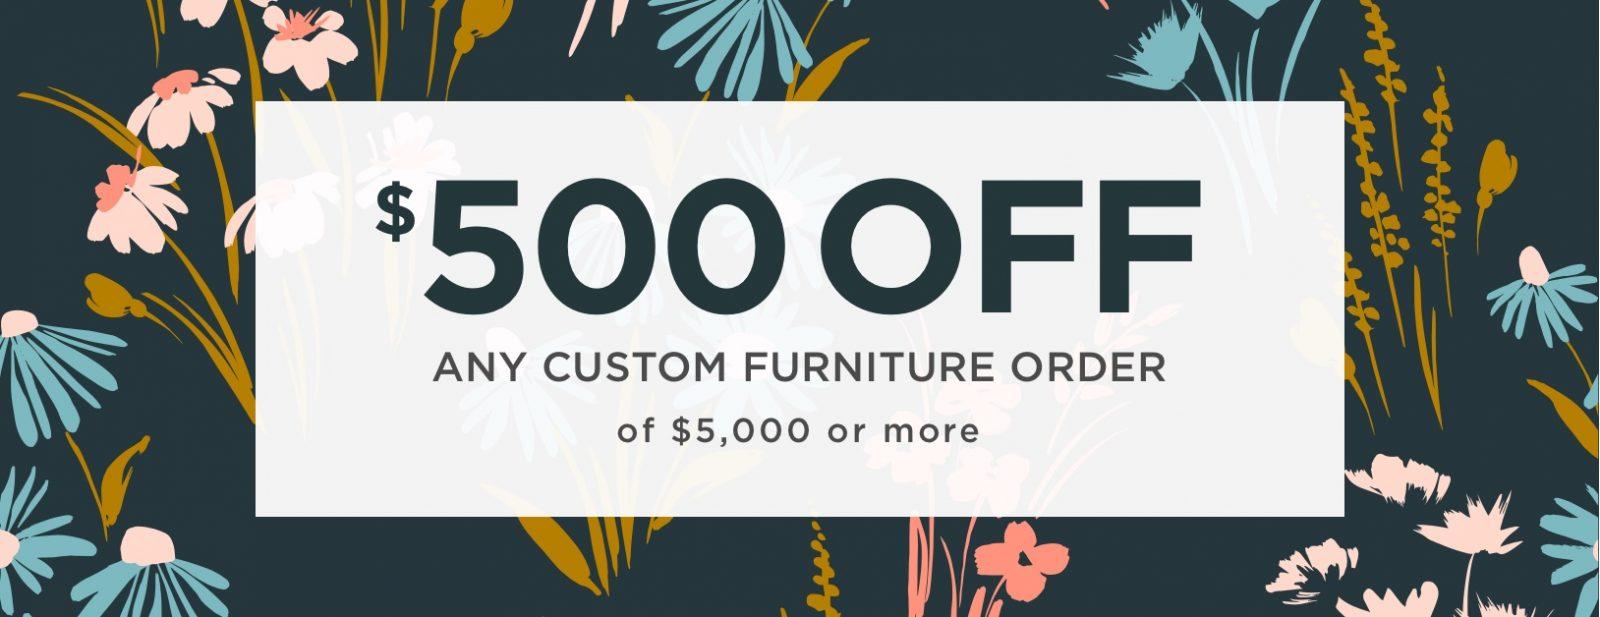 Yetzers-Furniture--500-Promotion-Landing-Coupon